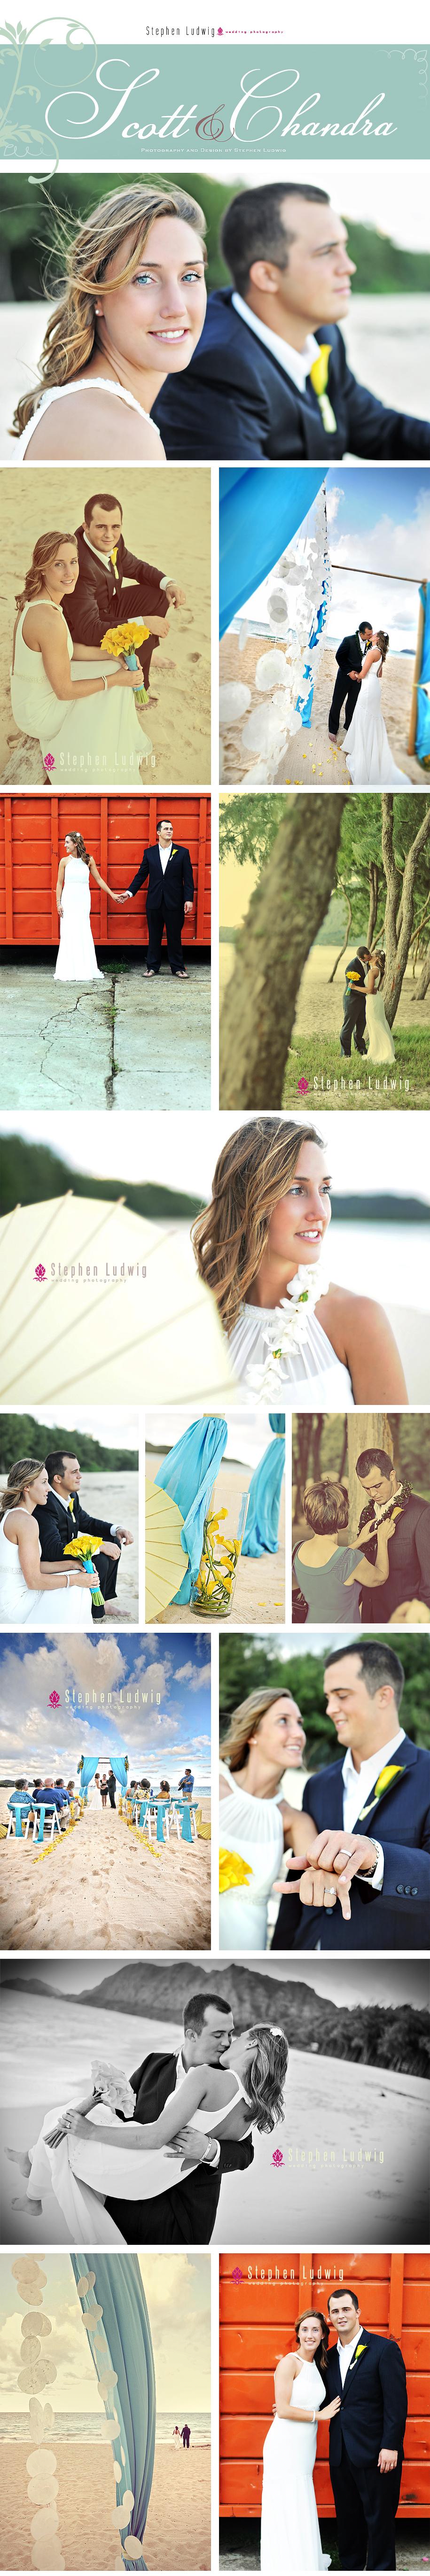 Stephen-Ludwig-Wedding-Photography--Scott-and-Chandra-1